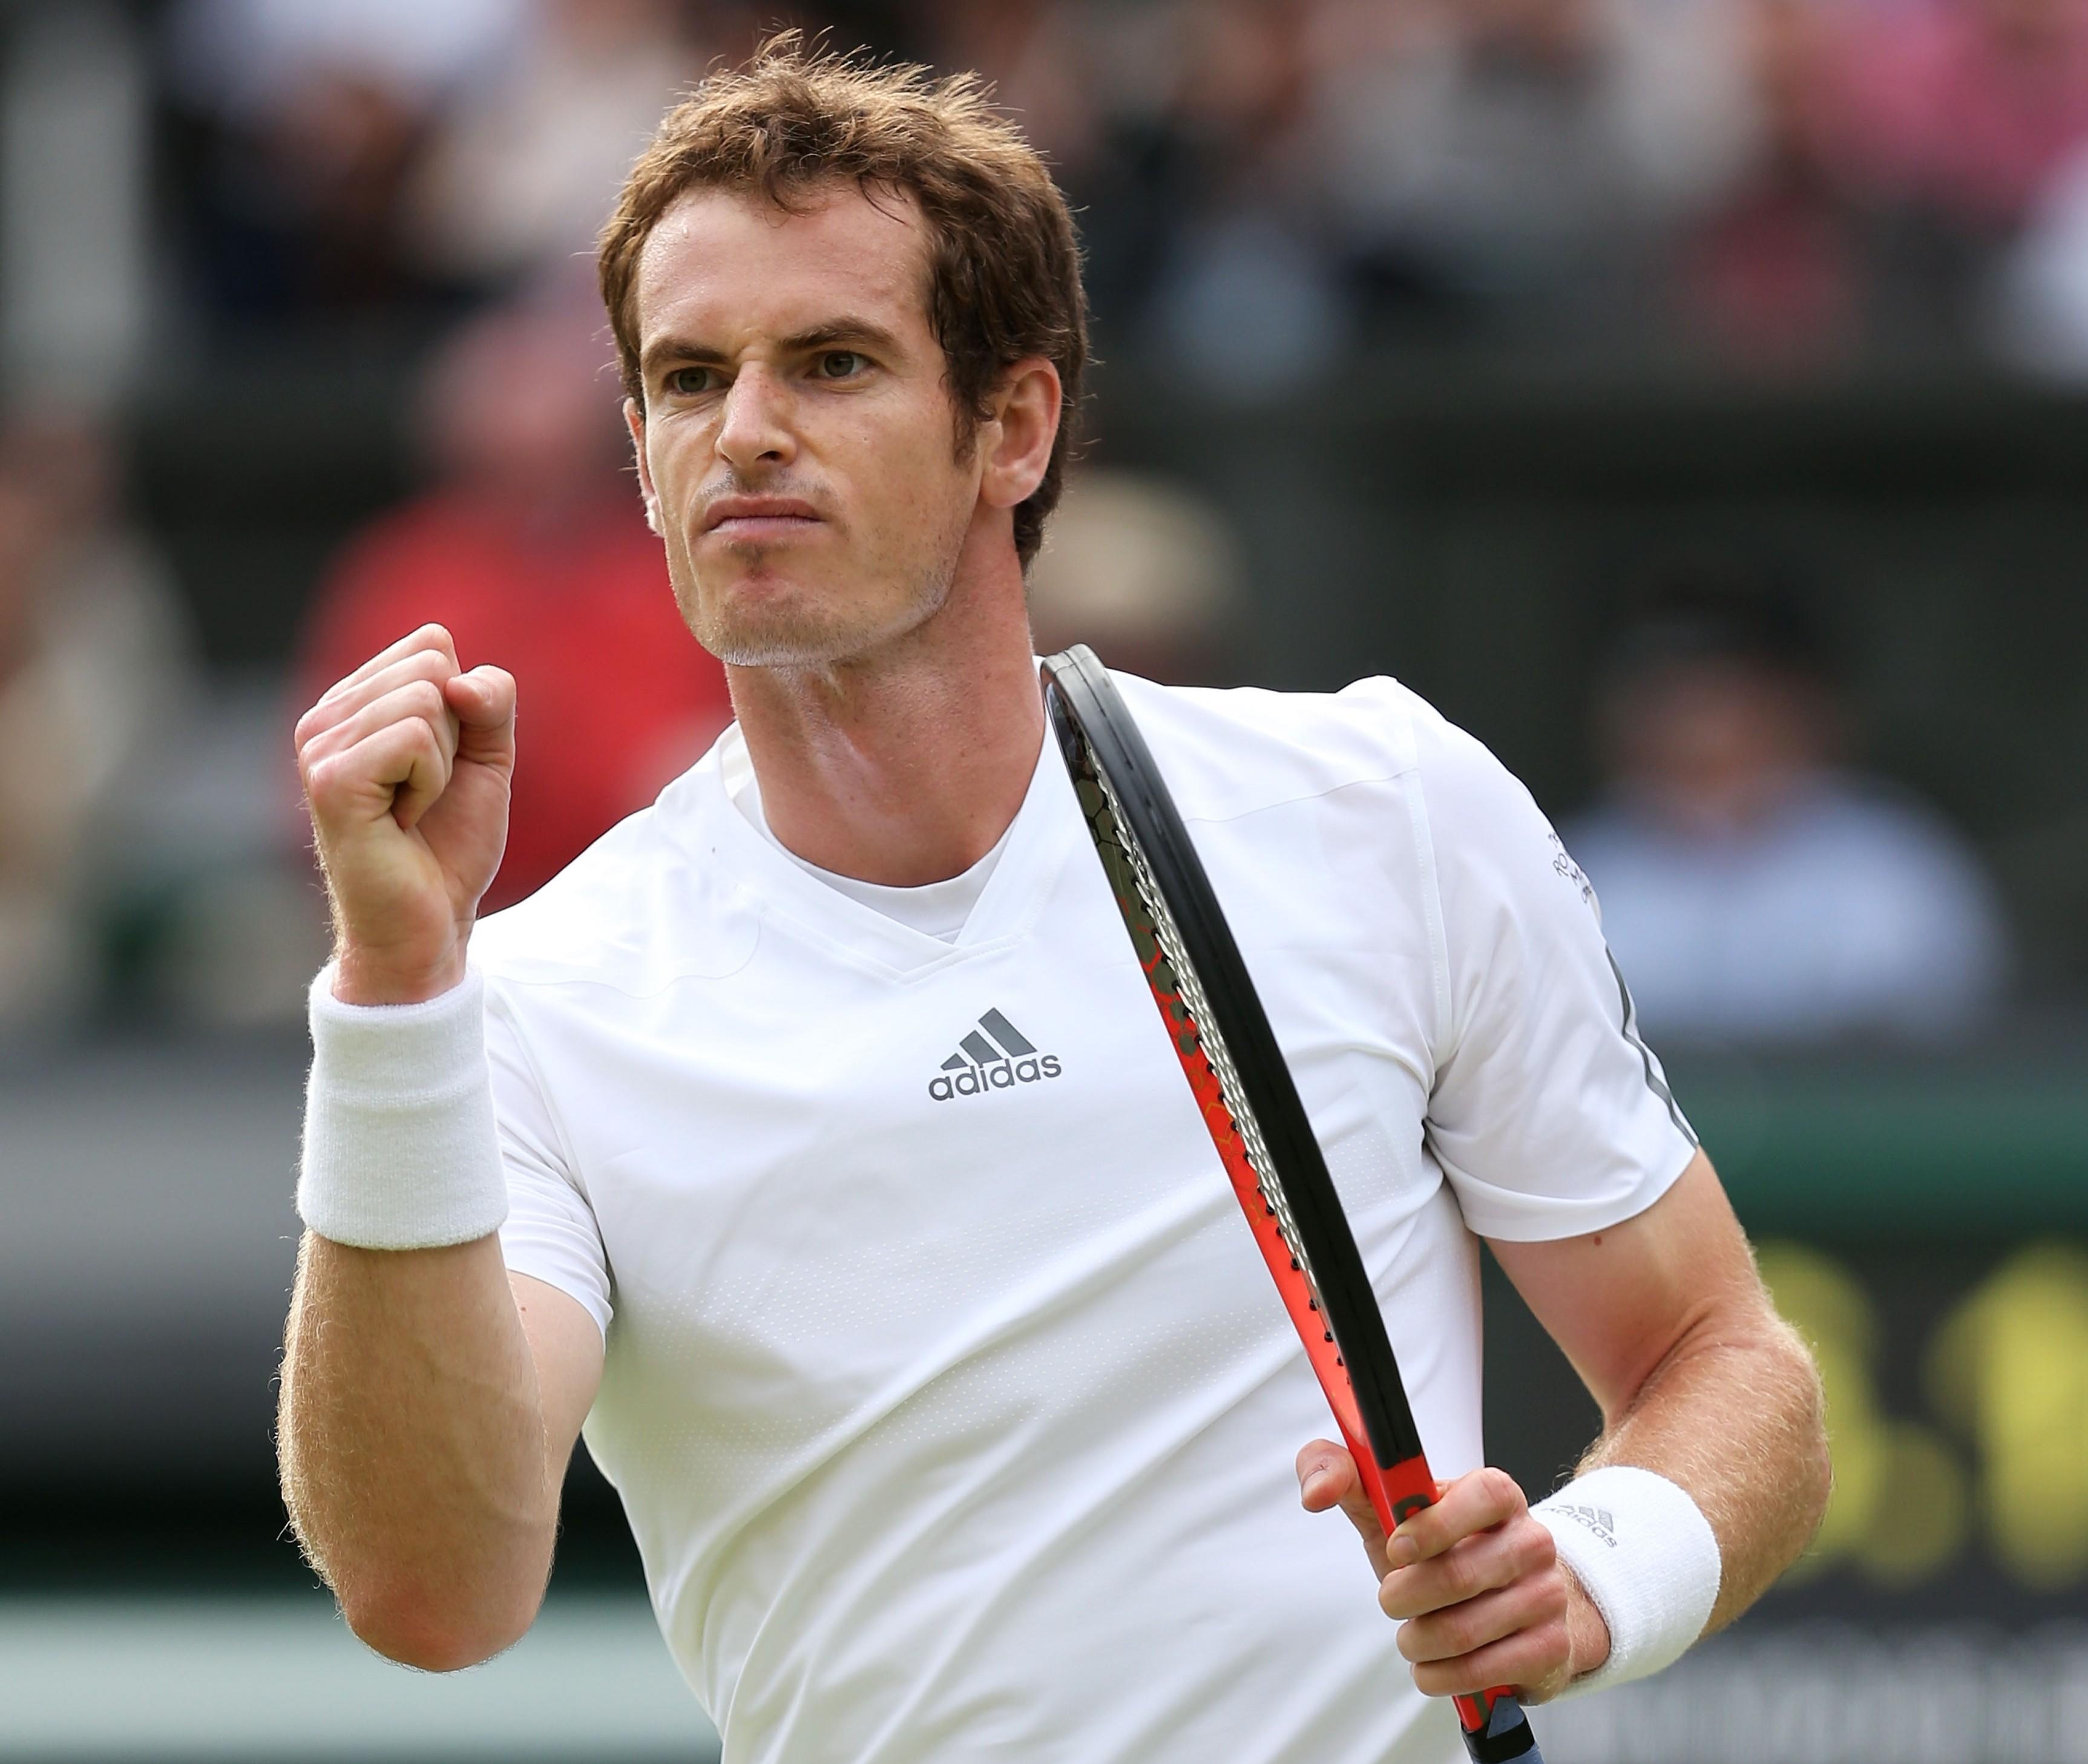 Andy Murray makes Wimbledon semi-finals after stunning comeback against Fernando Verdasco